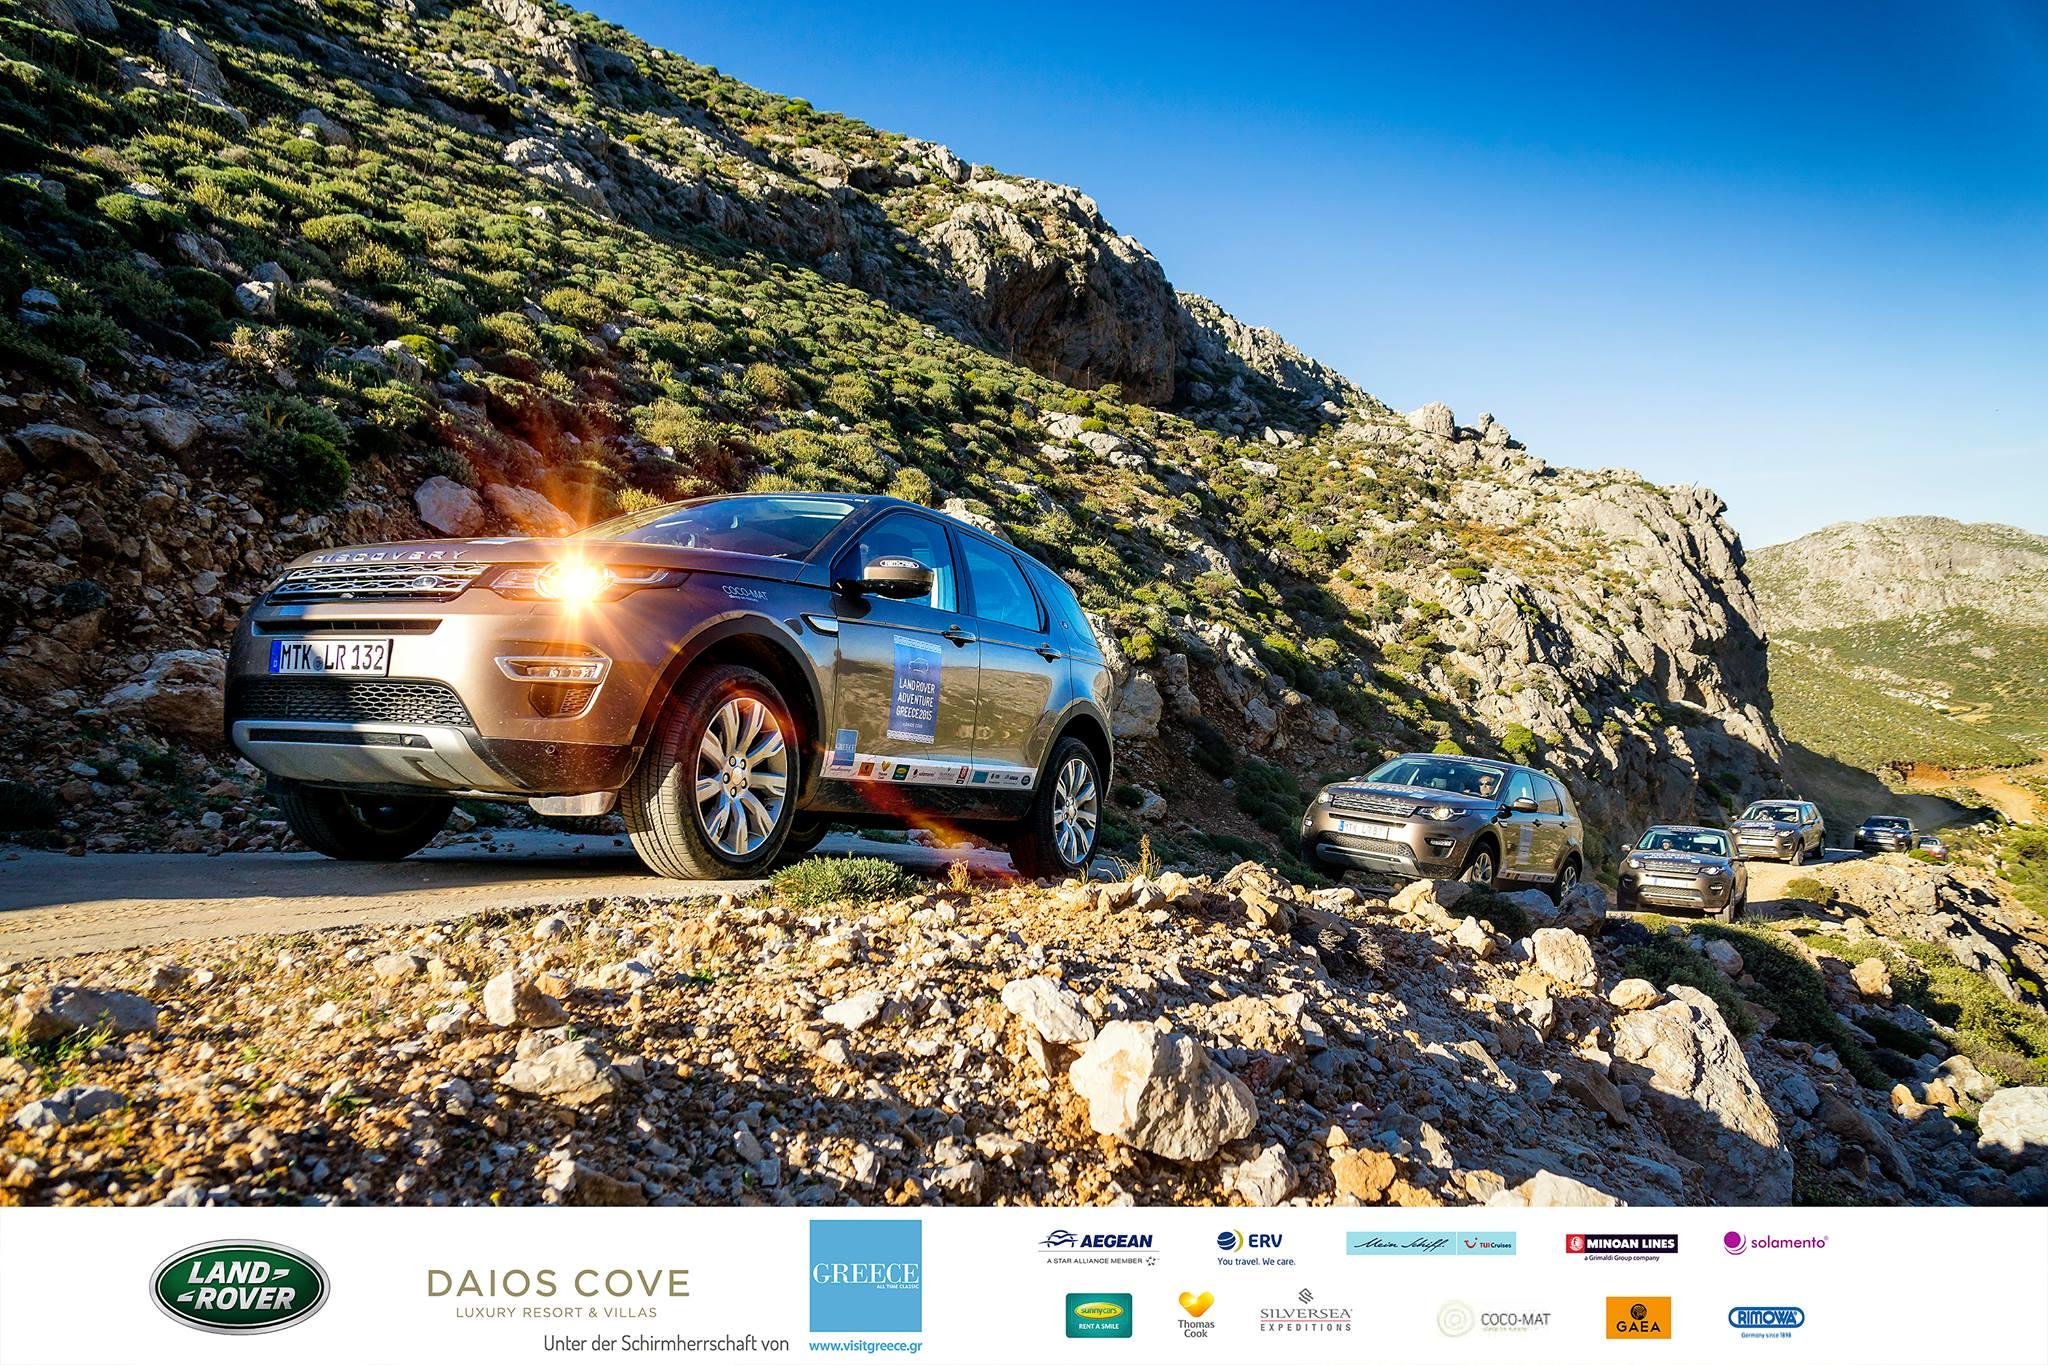 Land Rover Adventure Tour Kreta 2015